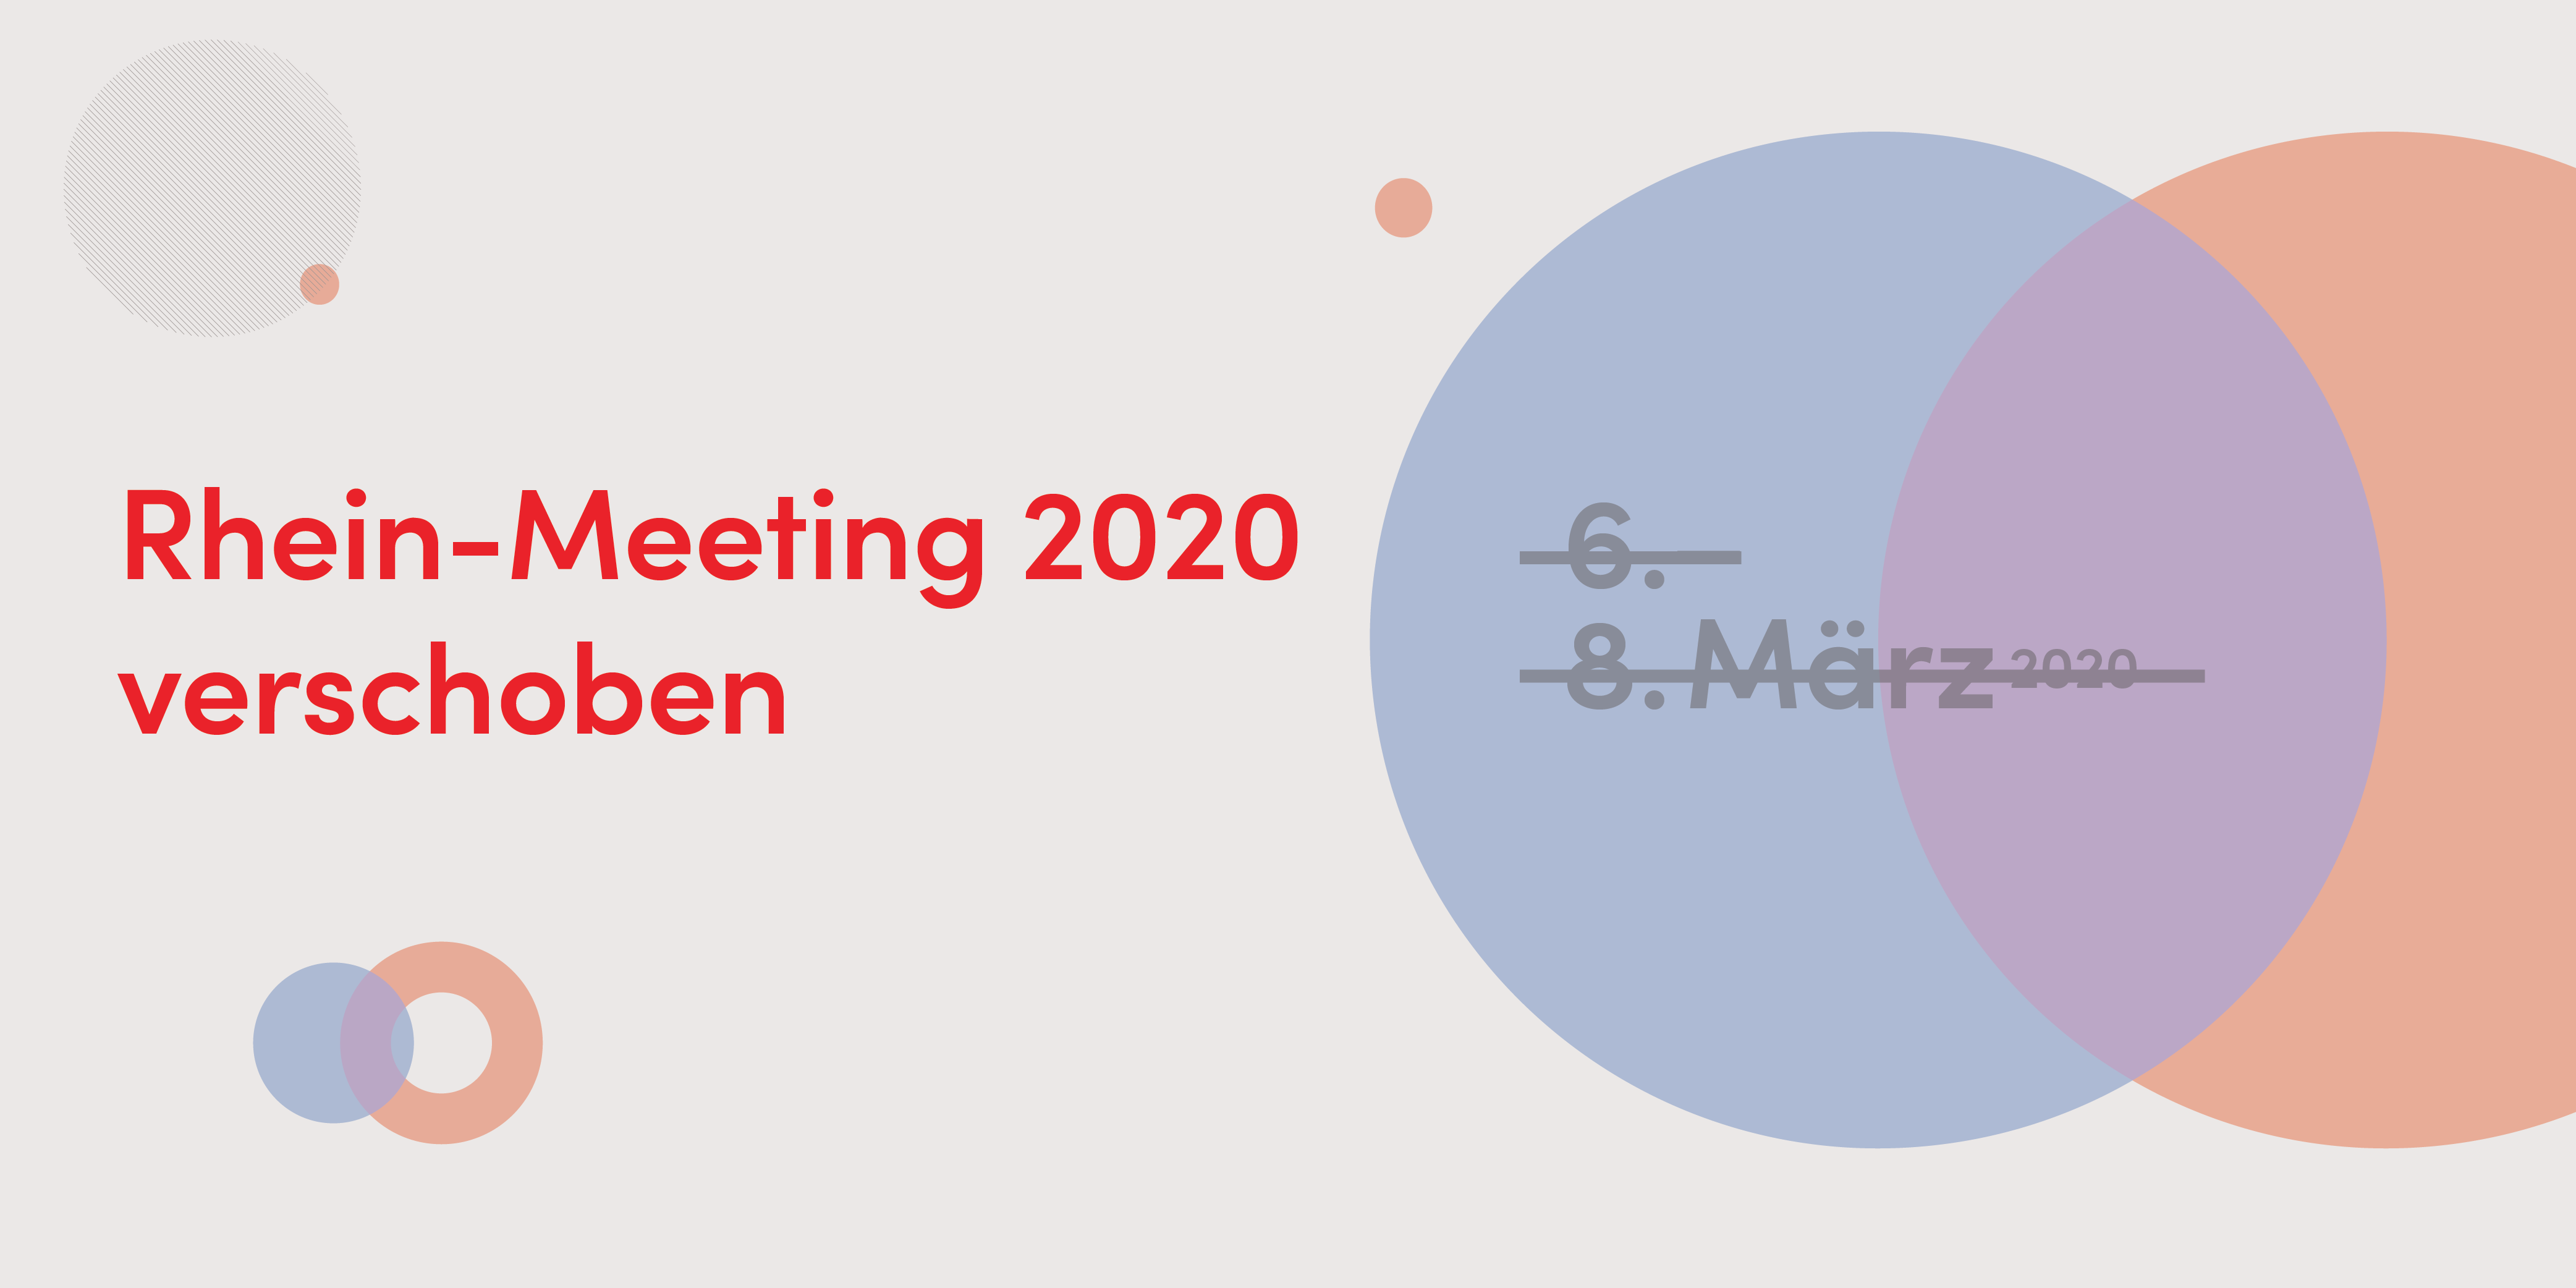 Rhein-Meeting 2020 verschoben